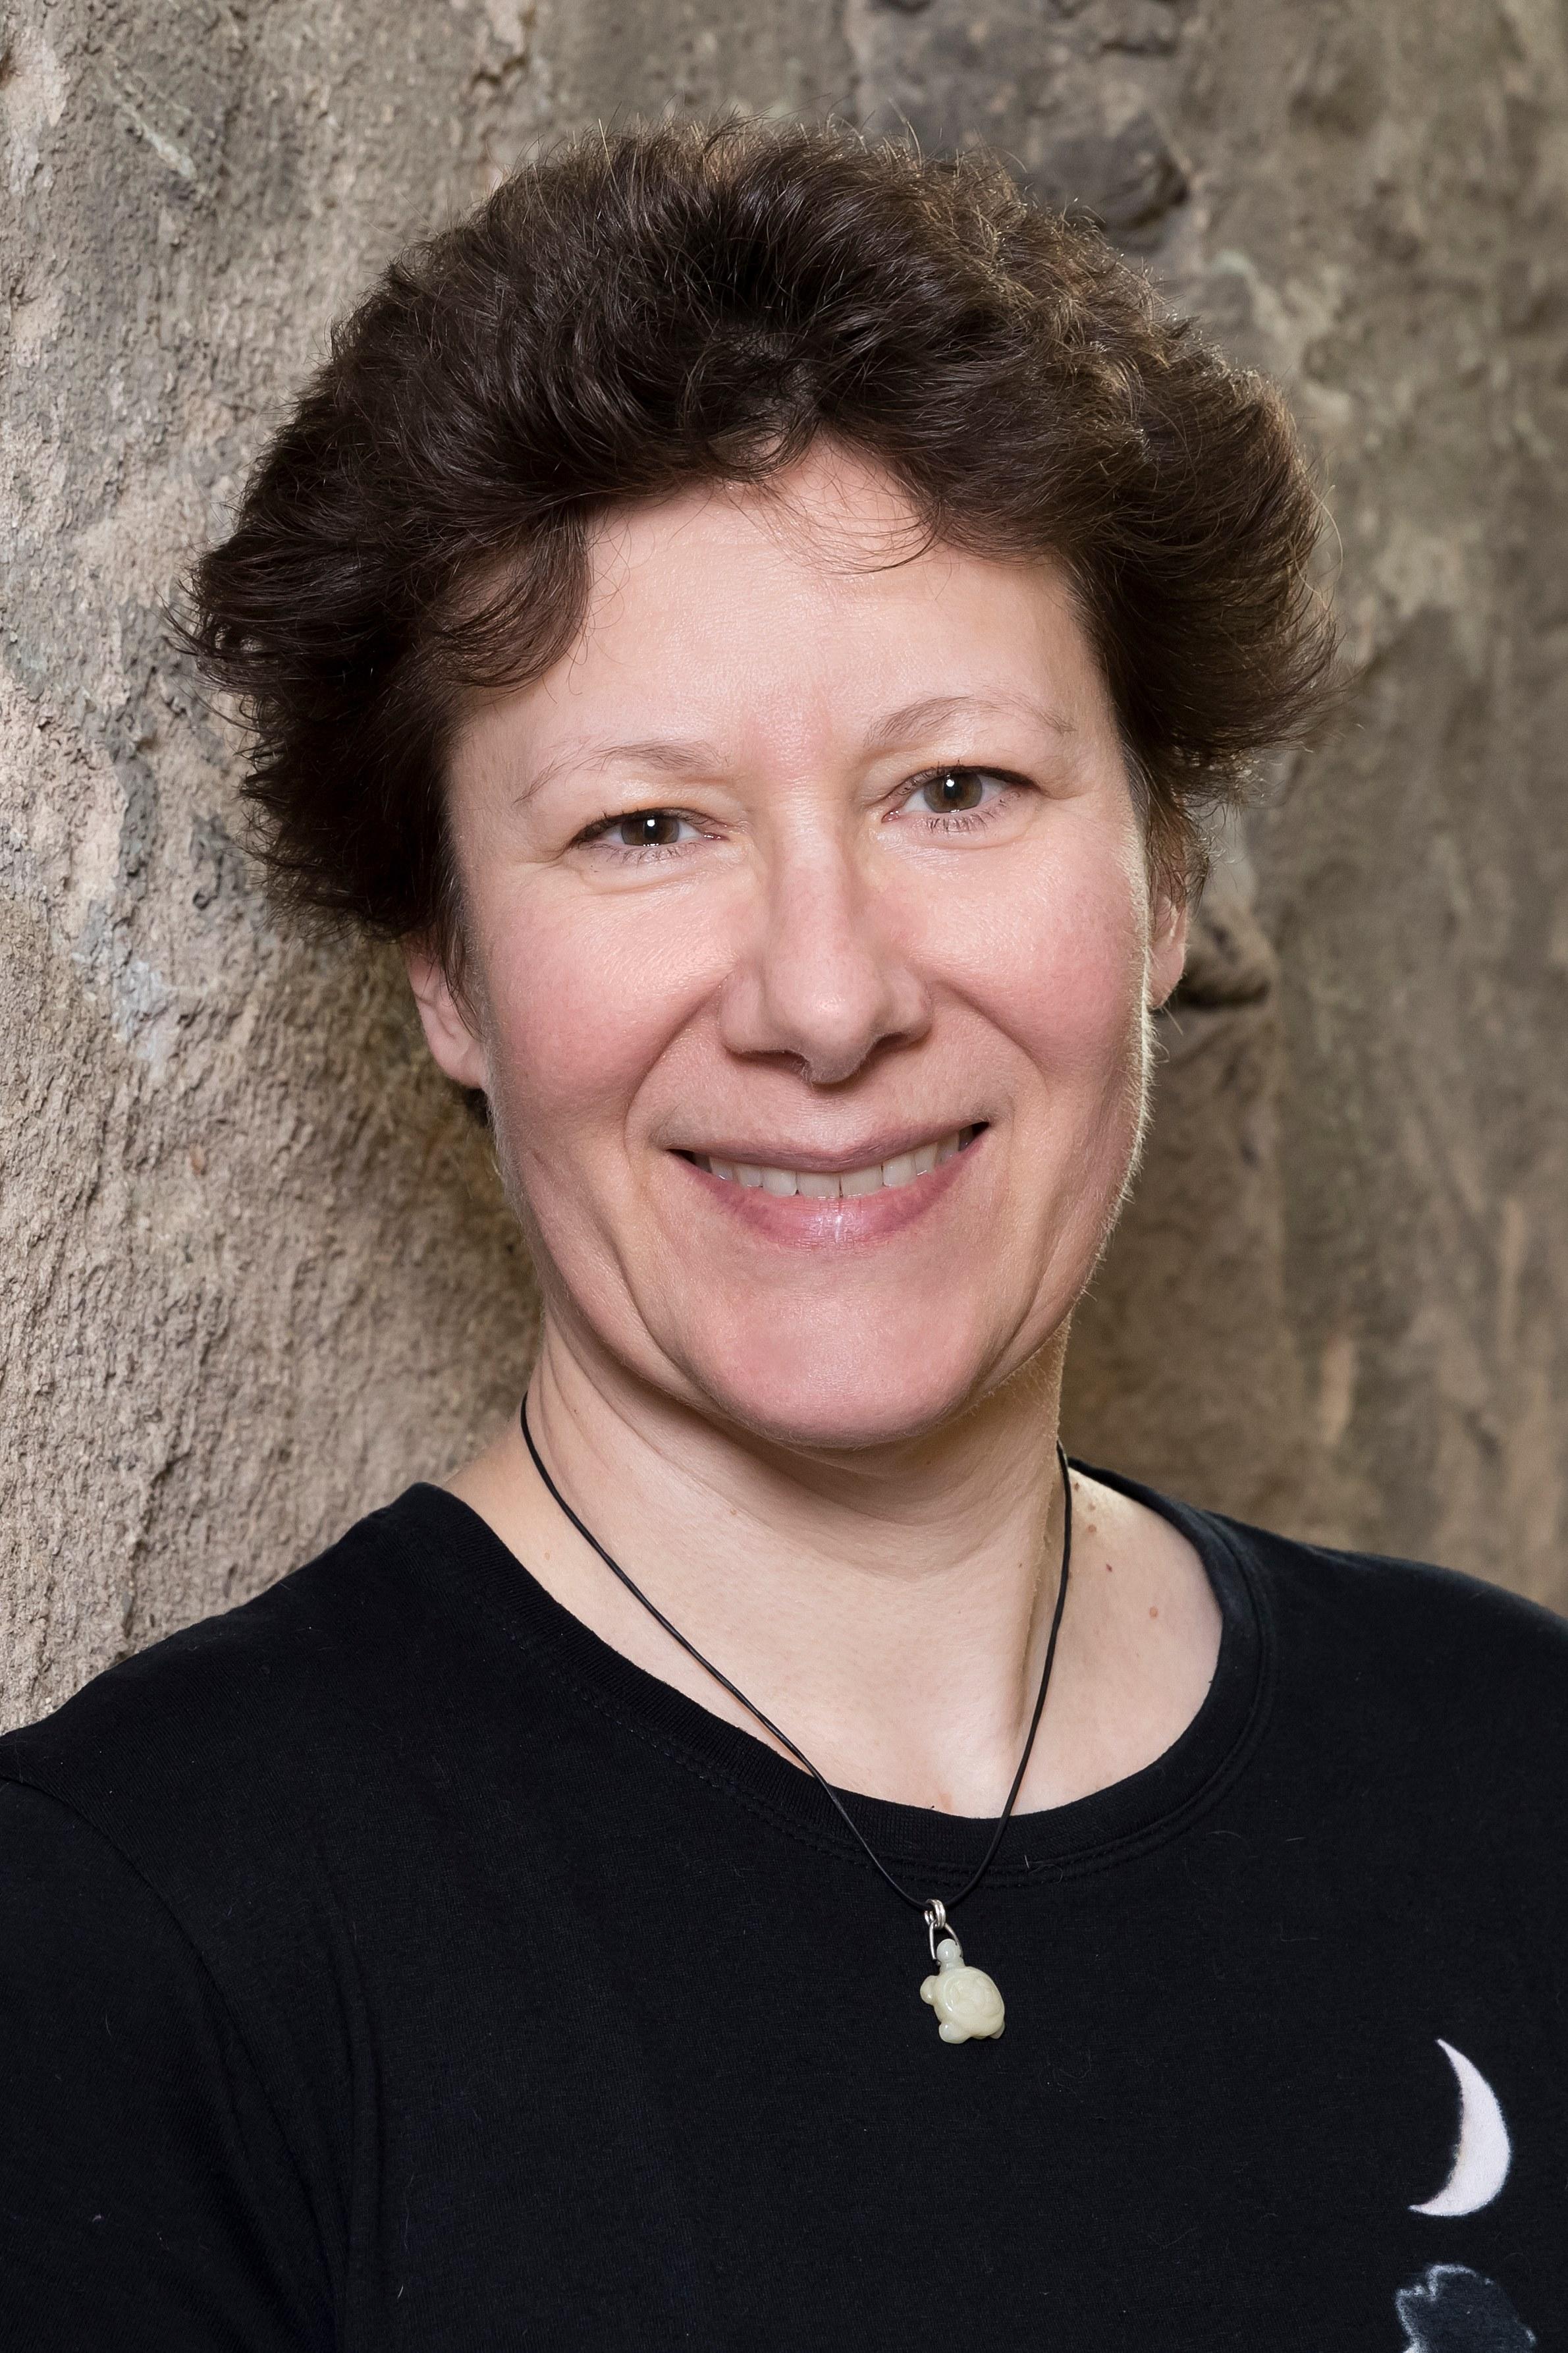 Eva-Marie Janelo